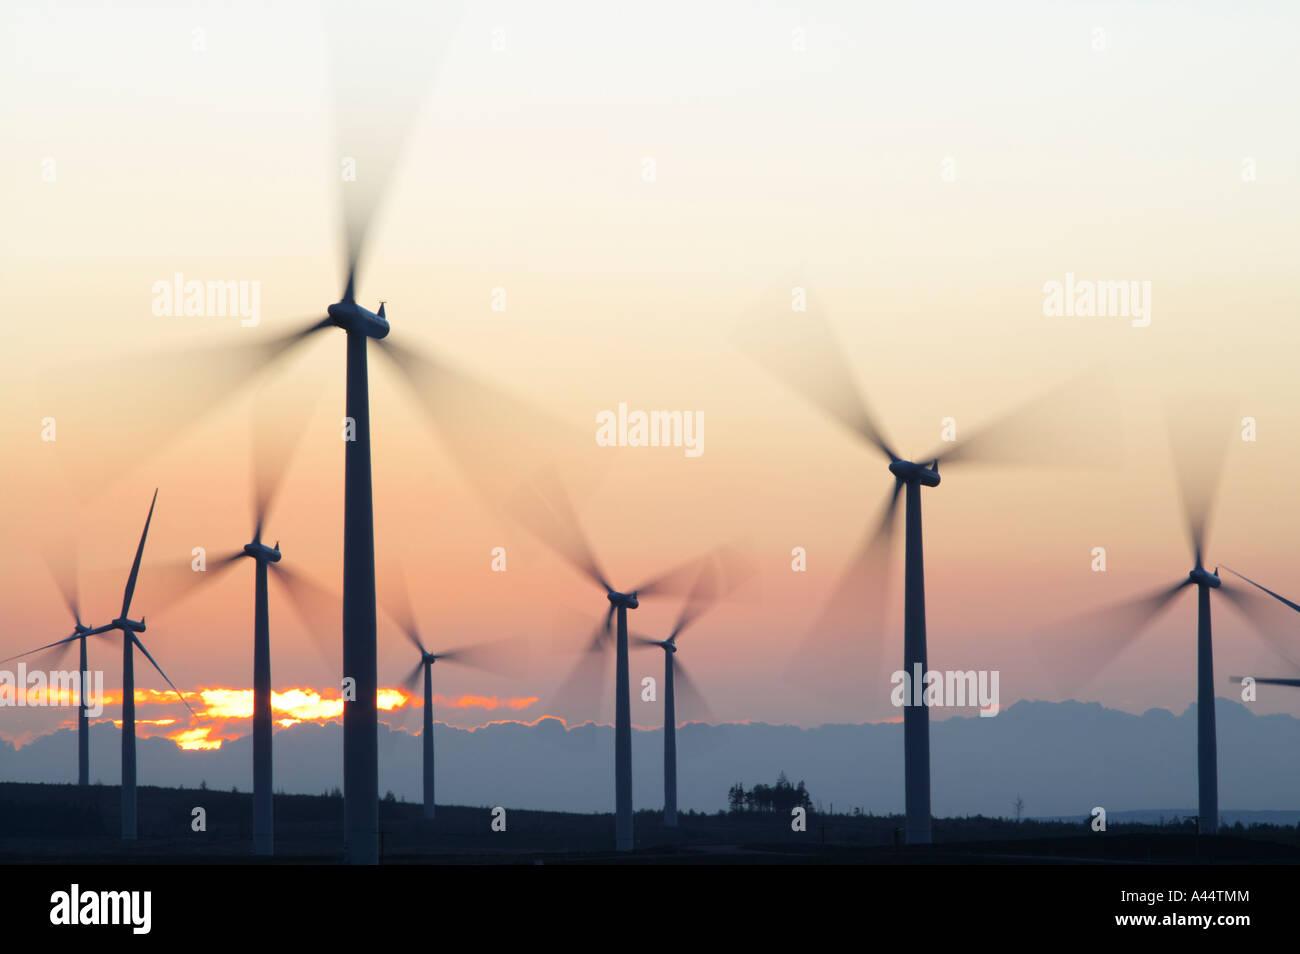 Black Law Wind Farm near Forth, South Lanarkshire, Scotland, UK - Stock Image